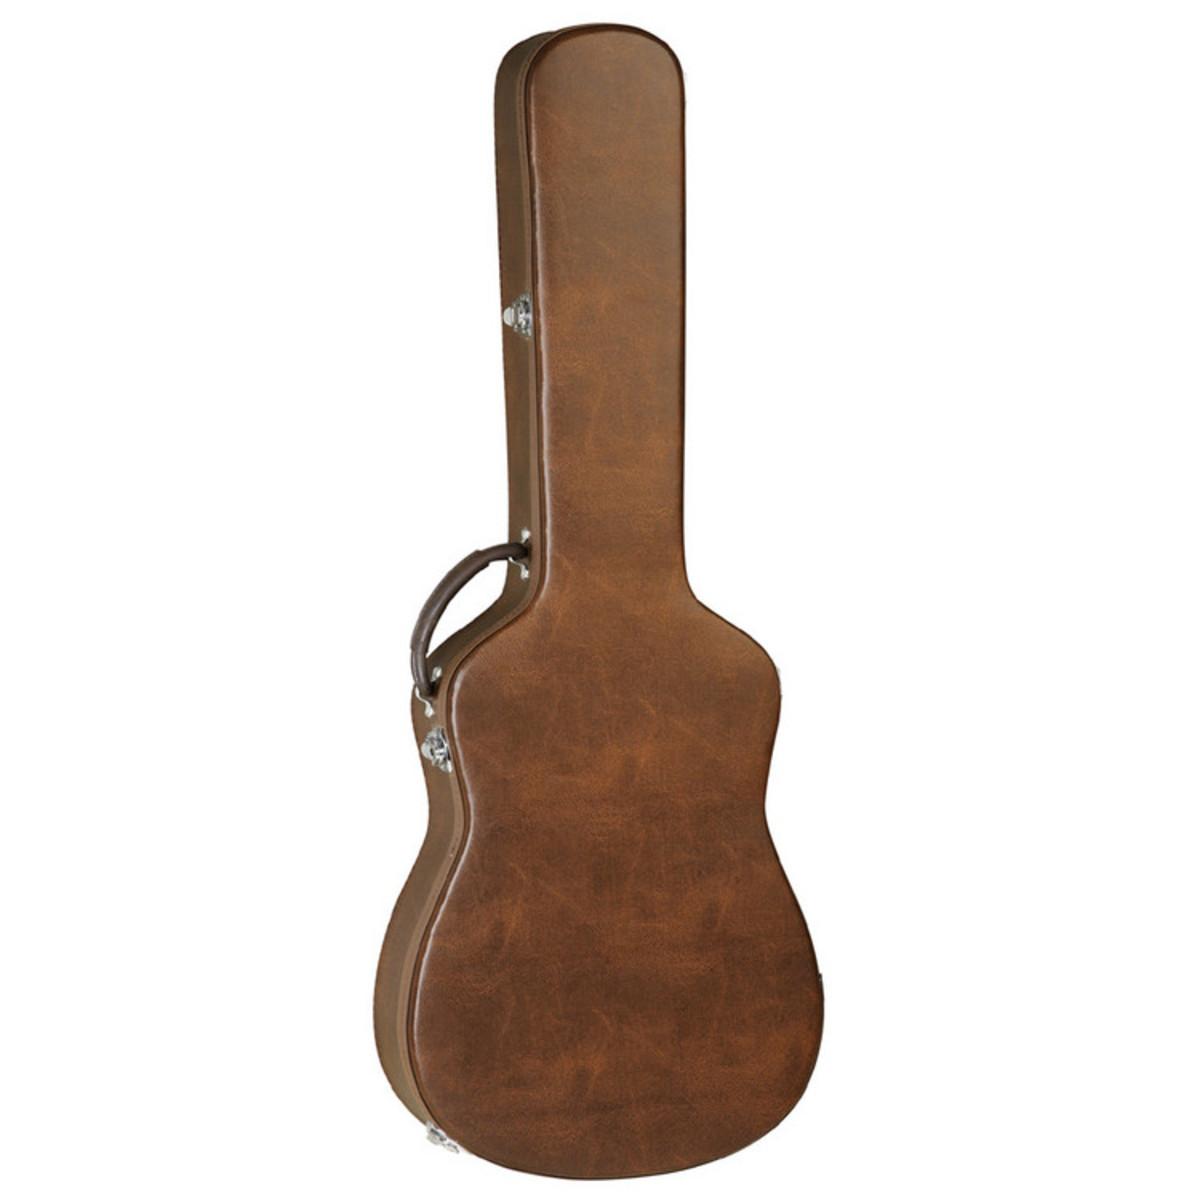 disc tanglewood nashville brown leather guitar case at gear4music. Black Bedroom Furniture Sets. Home Design Ideas